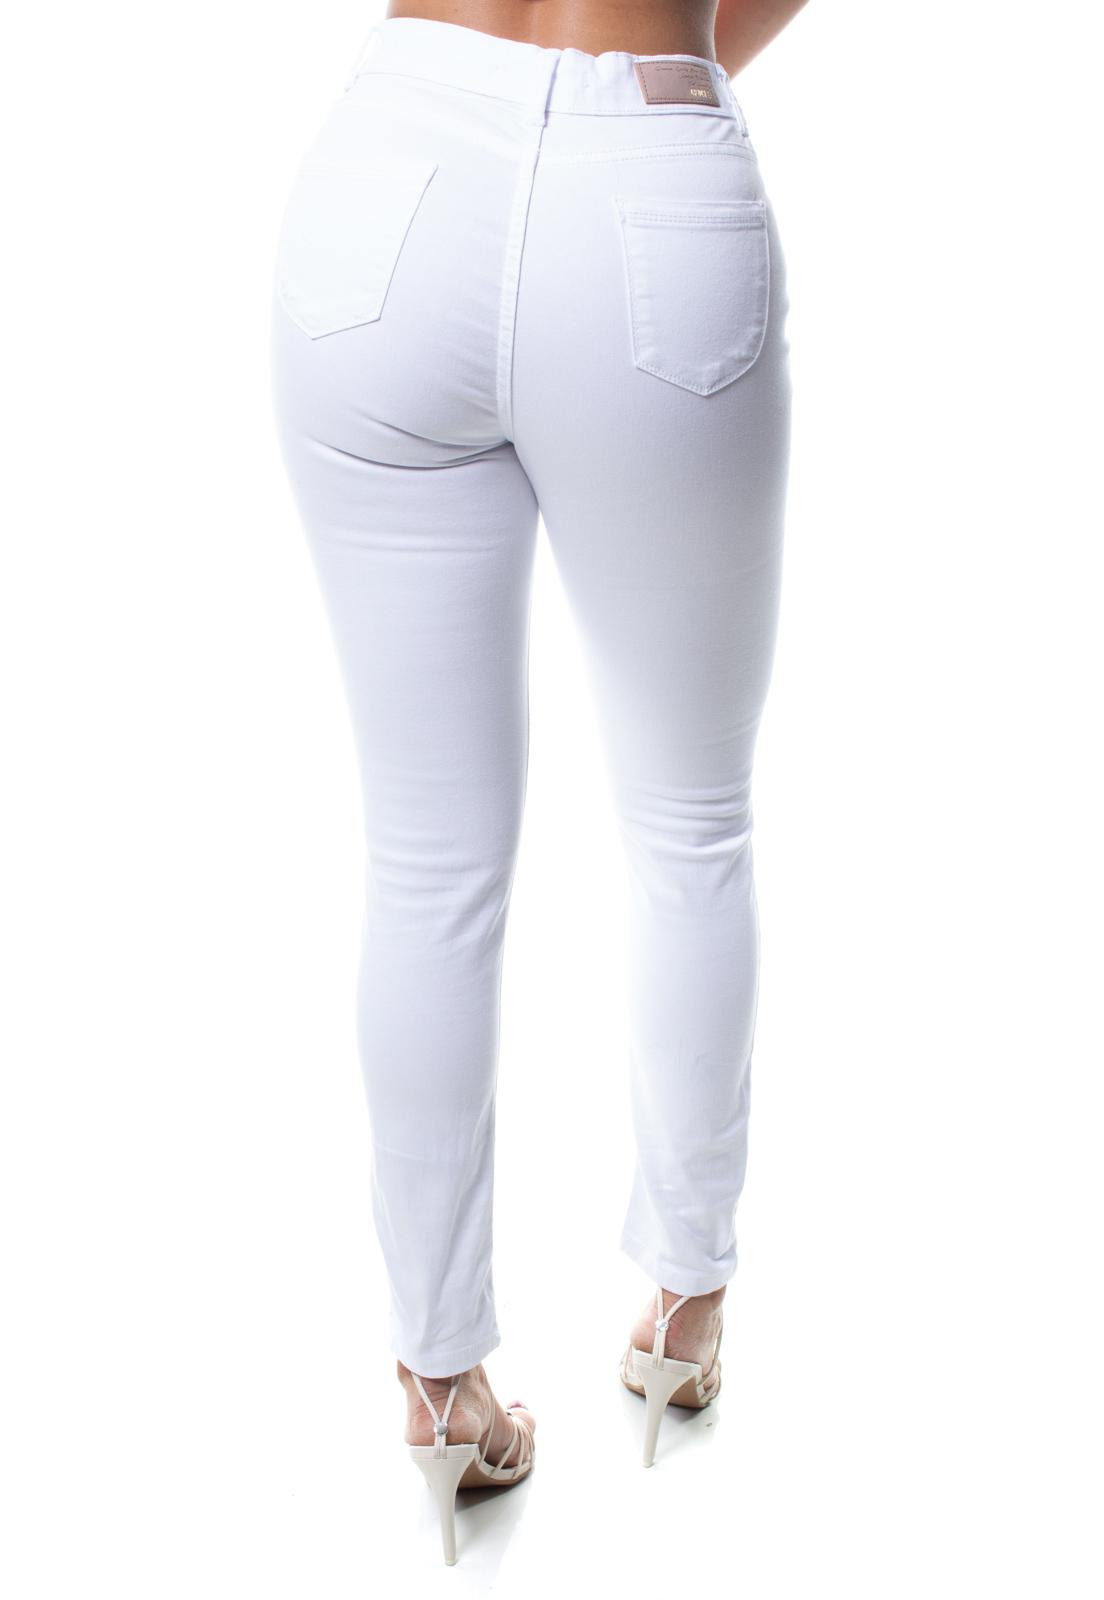 Calça Jeans Feminina Skinny Crocker - 48264  - CROCKER JEANS